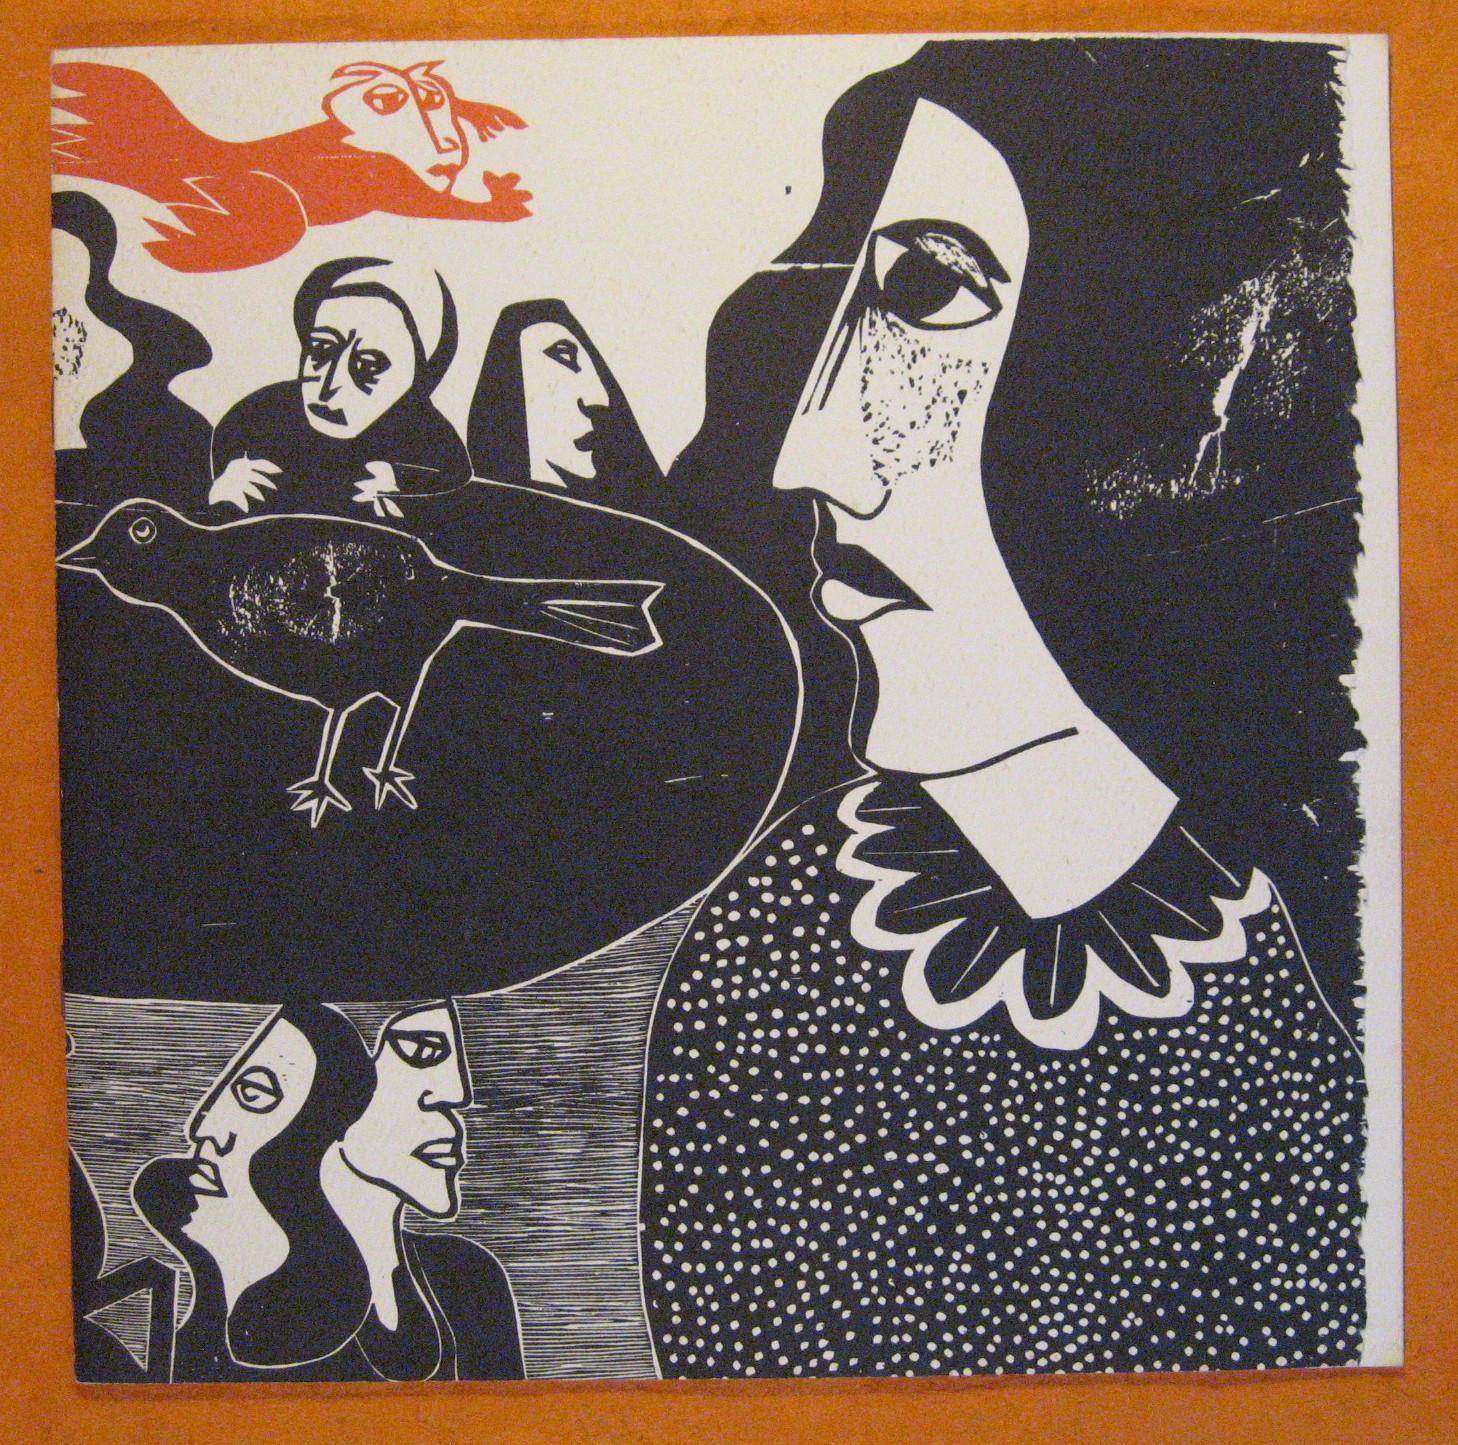 Naul Ojeda:  Woodcuts and Linocuts November 25 to December 24, 1980, Ojeda, Naul